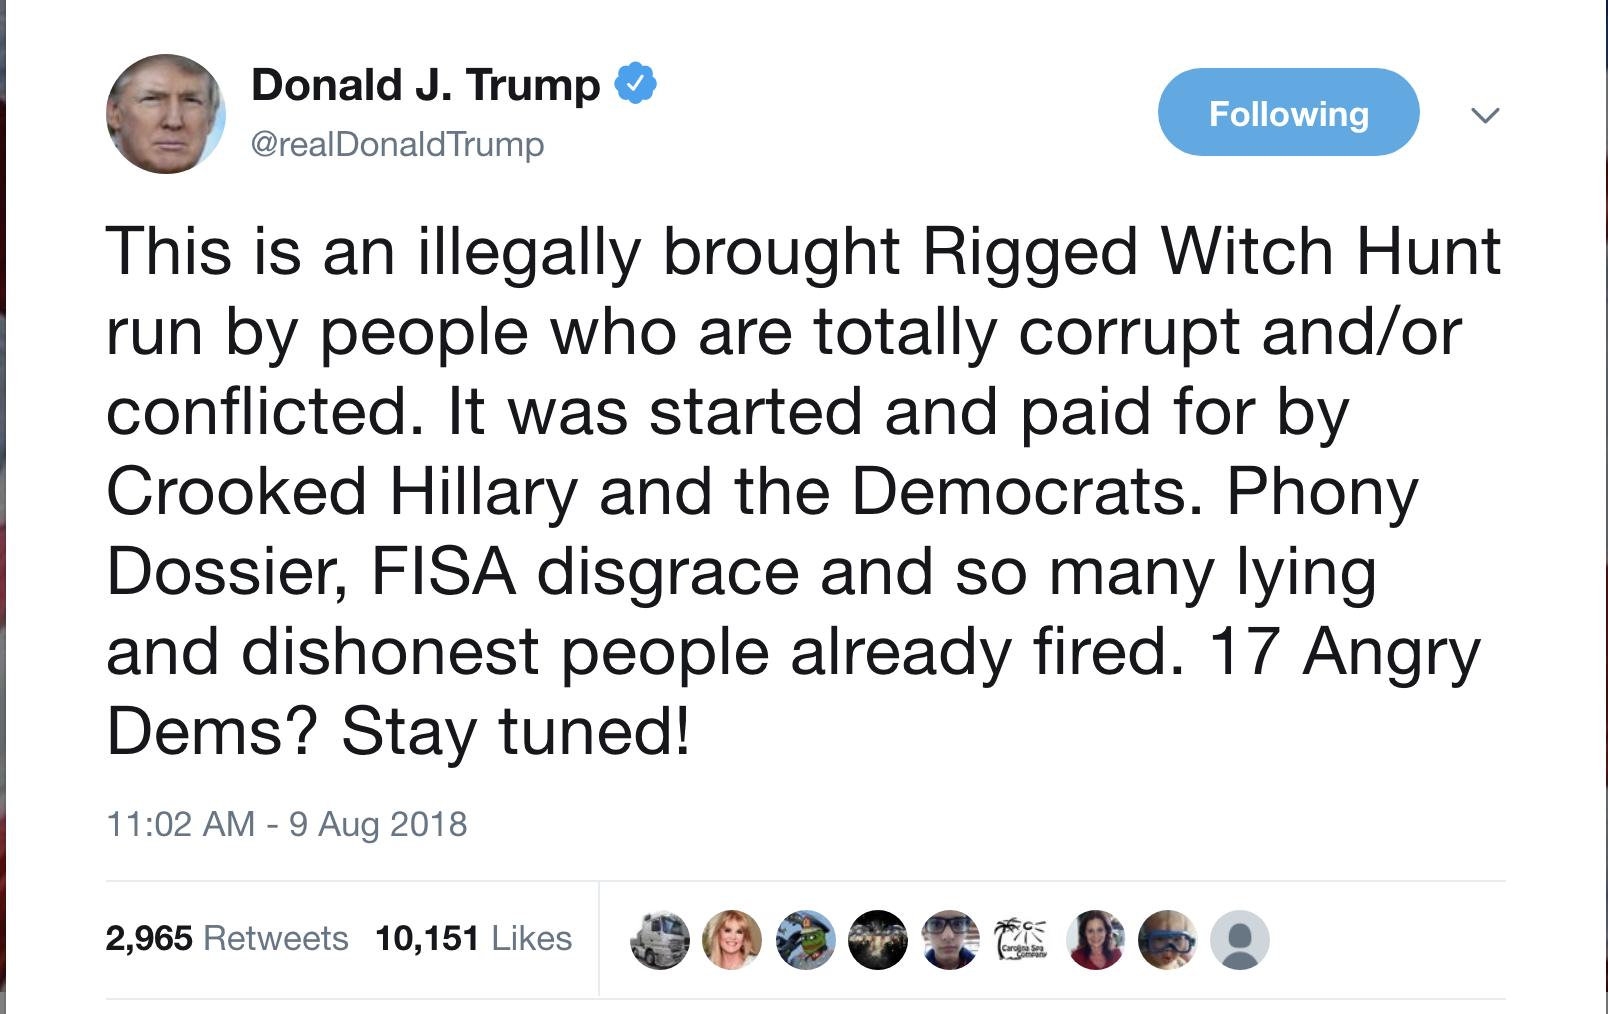 Screen-Shot-2018-08-09-at-11.16.48-AM Trump Has Mega Mueller Meltdown On Twitter After Thursday AM Court Revelations Corruption Crime Donald Trump Mueller Politics Russia Science Top Stories